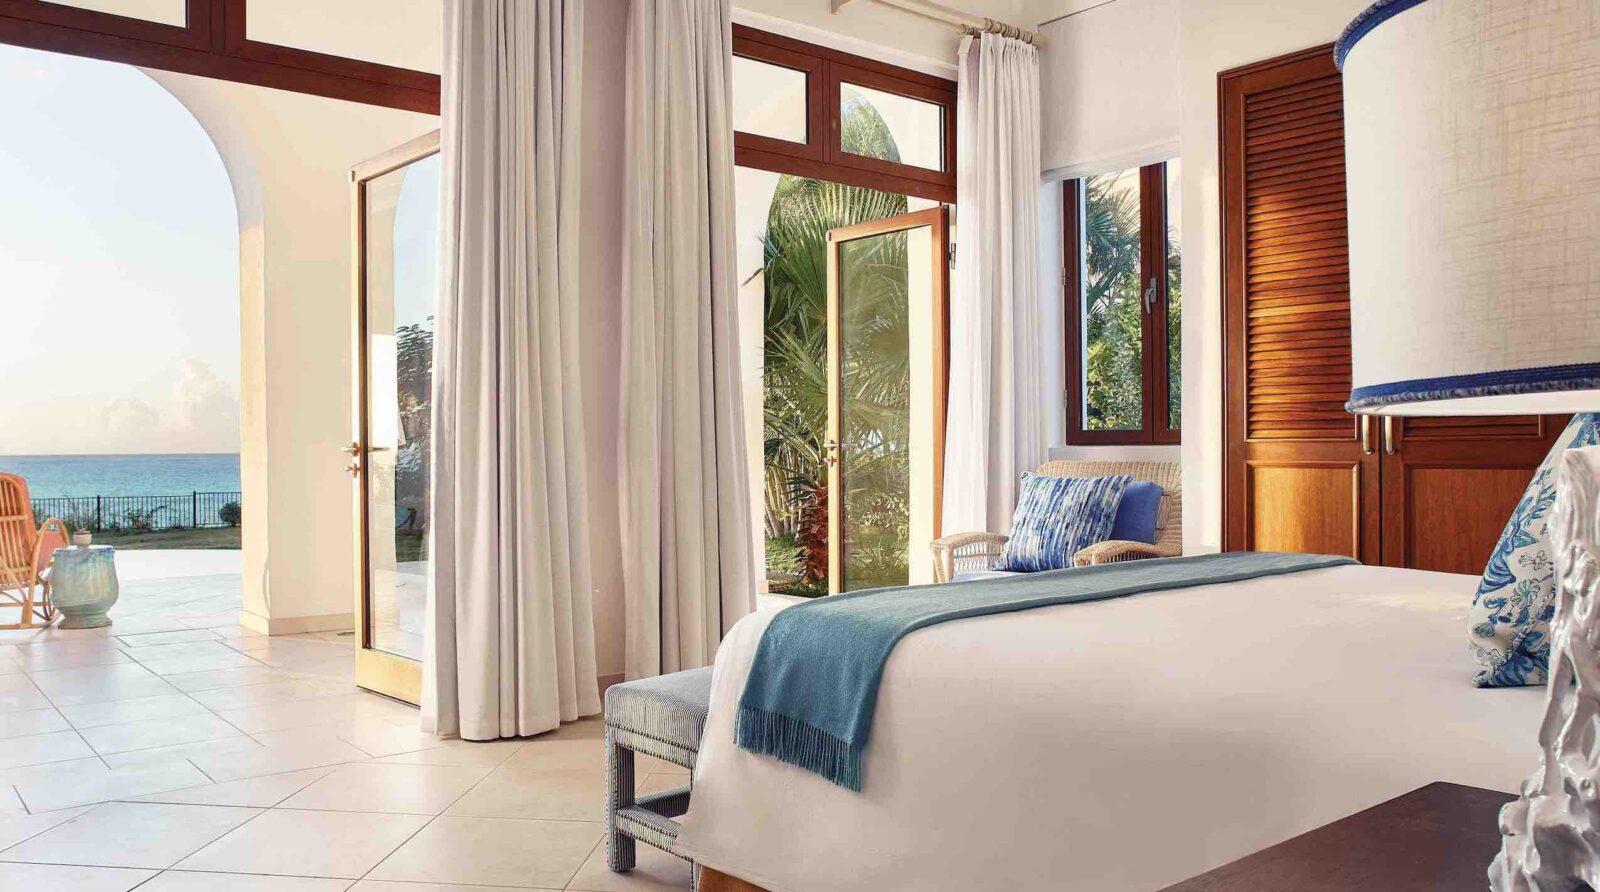 Belmond La Samanna bedroom with ocean view resorts in St Martin